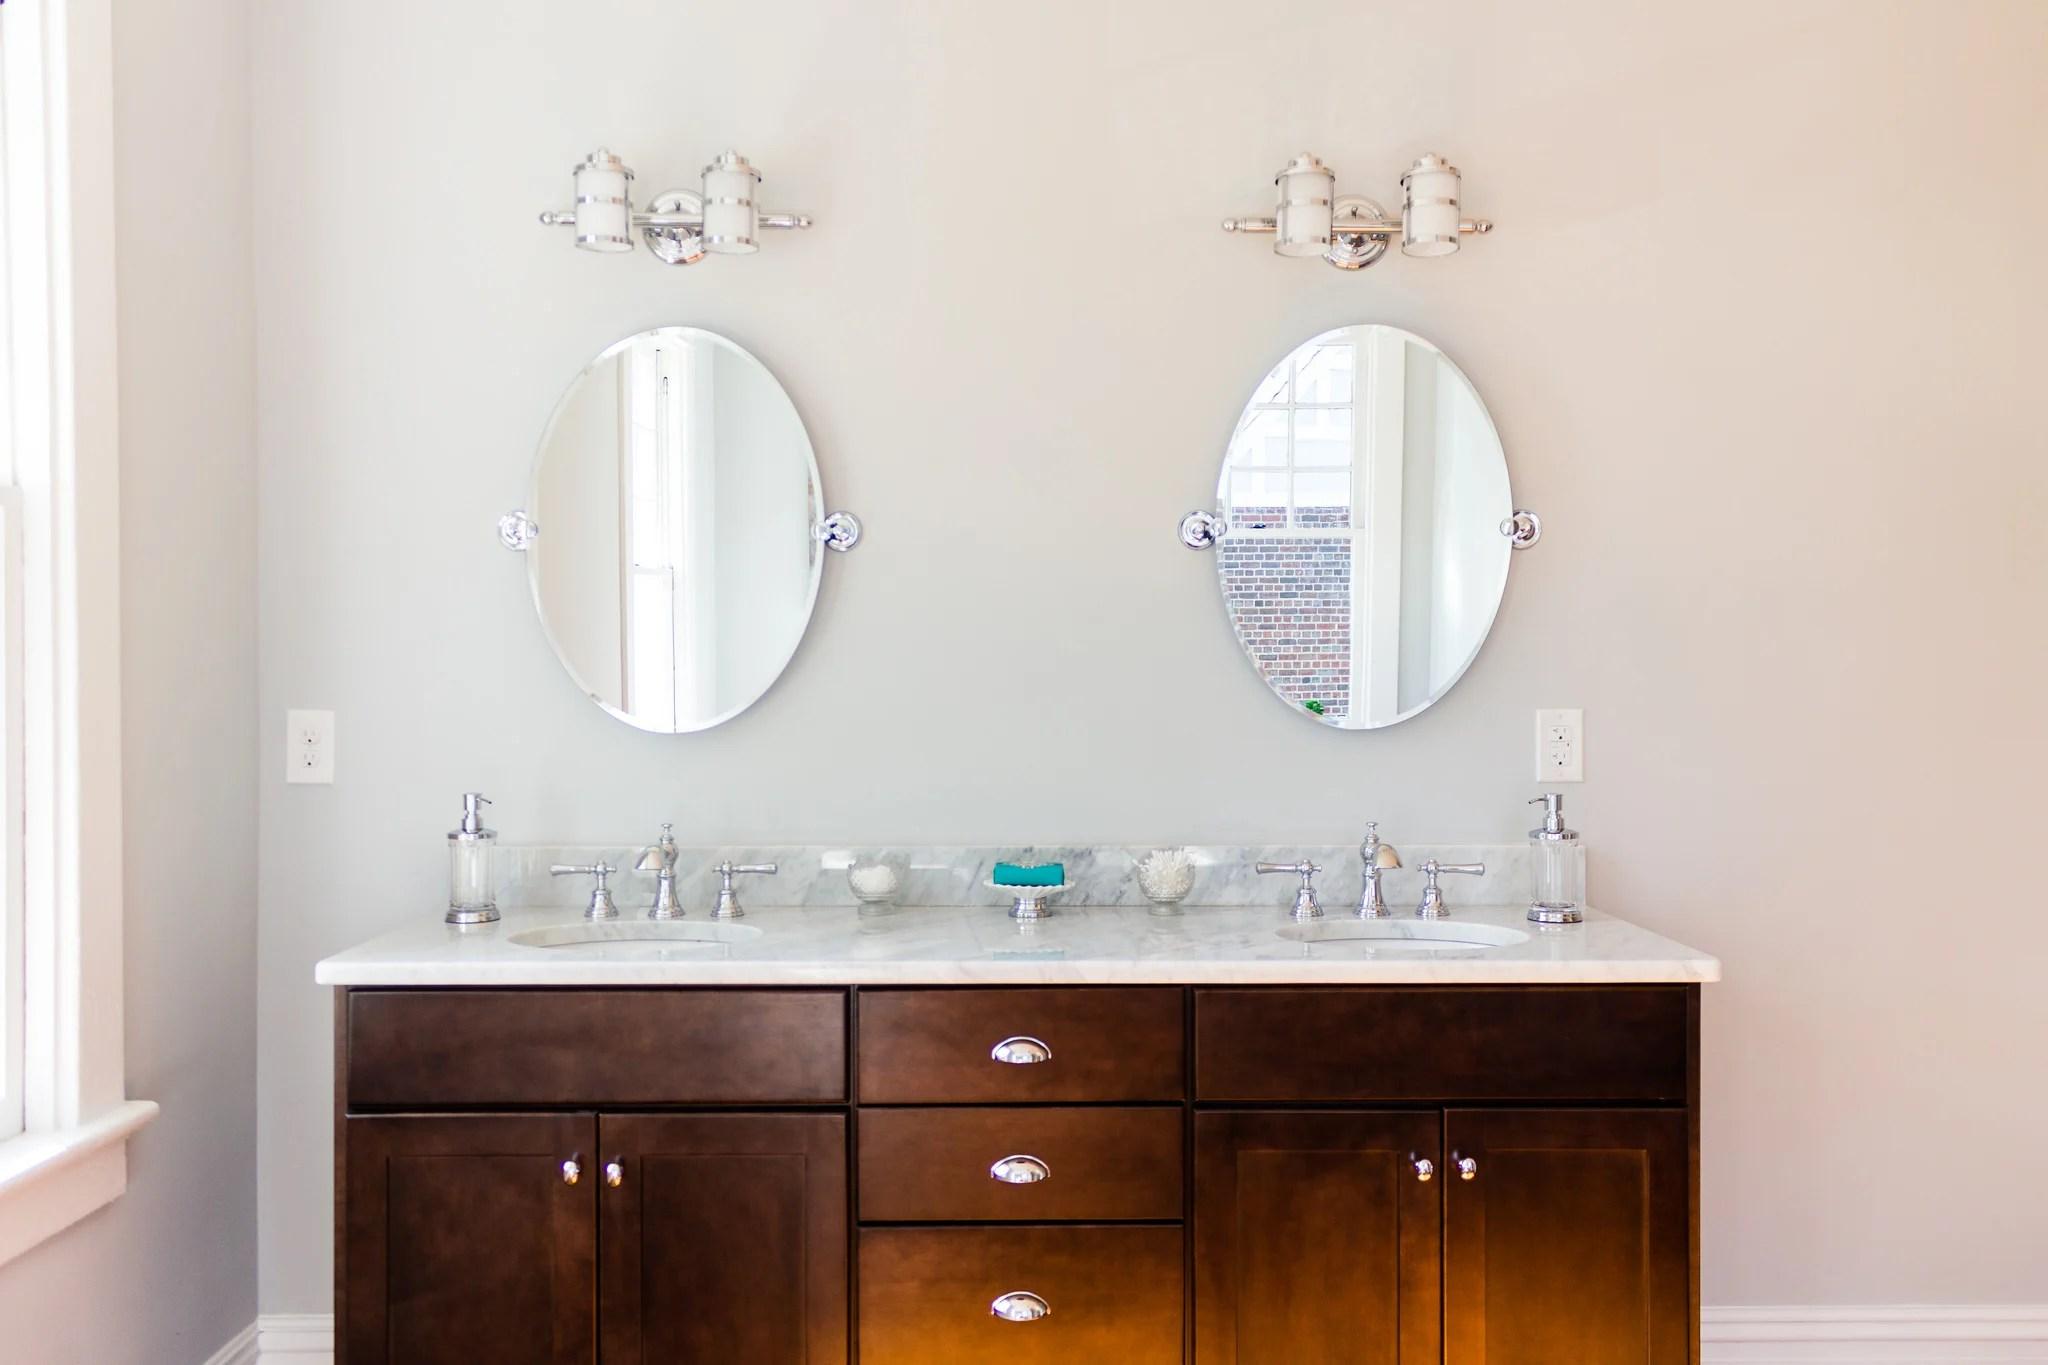 hawthorne spacious open bathroom with wood floor dark espresso double vanity mirrors remodelaholic